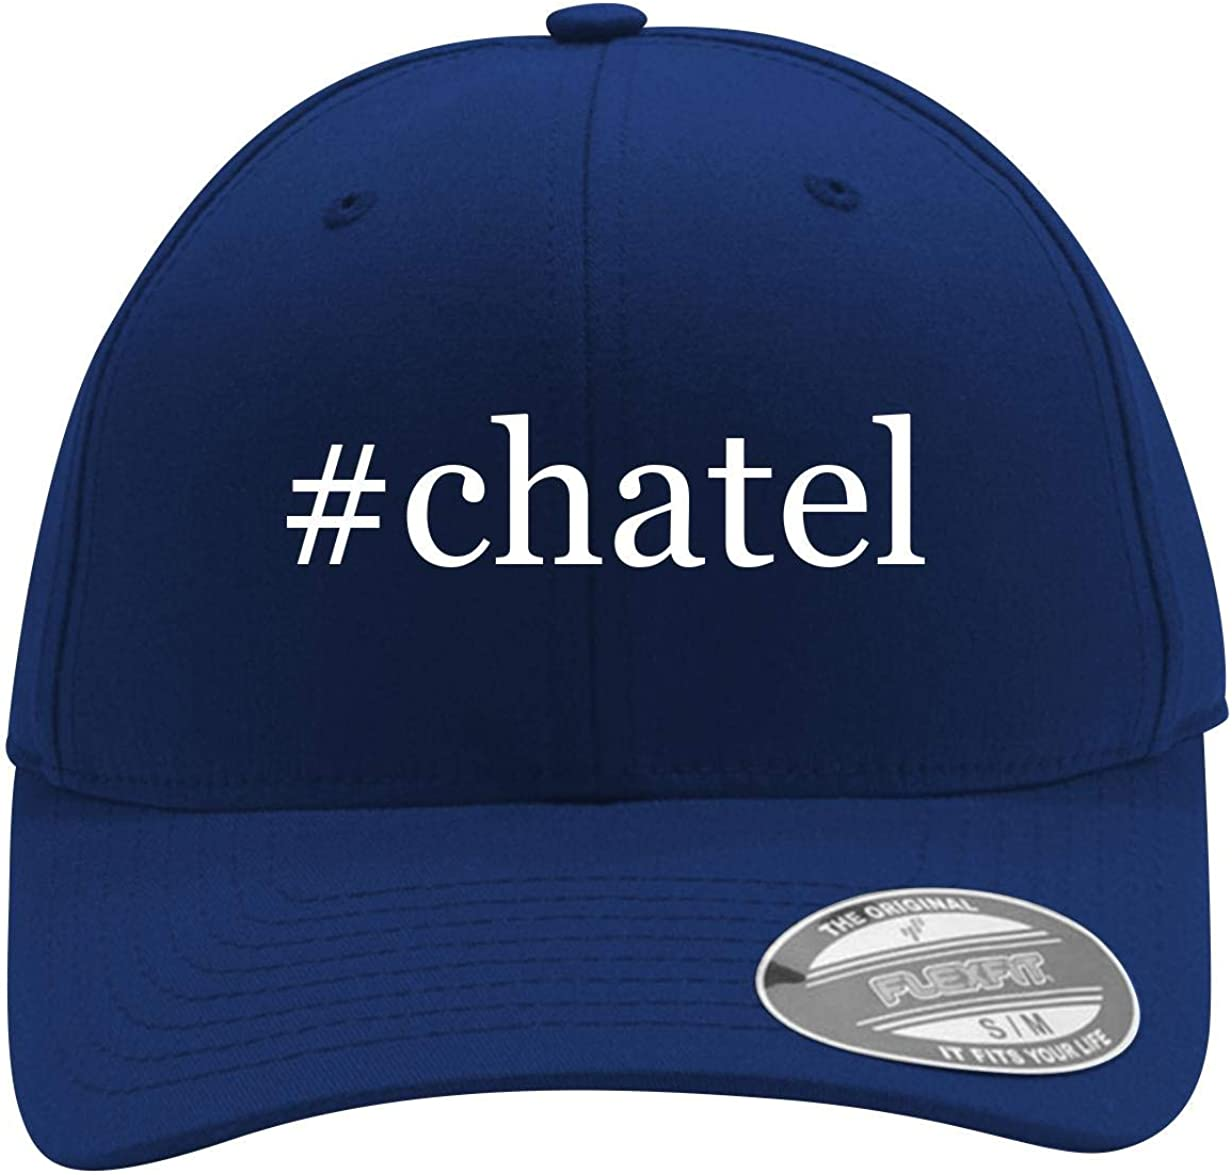 #Chatel - Men's Hashtag Flexfit Baseball Cap Hat